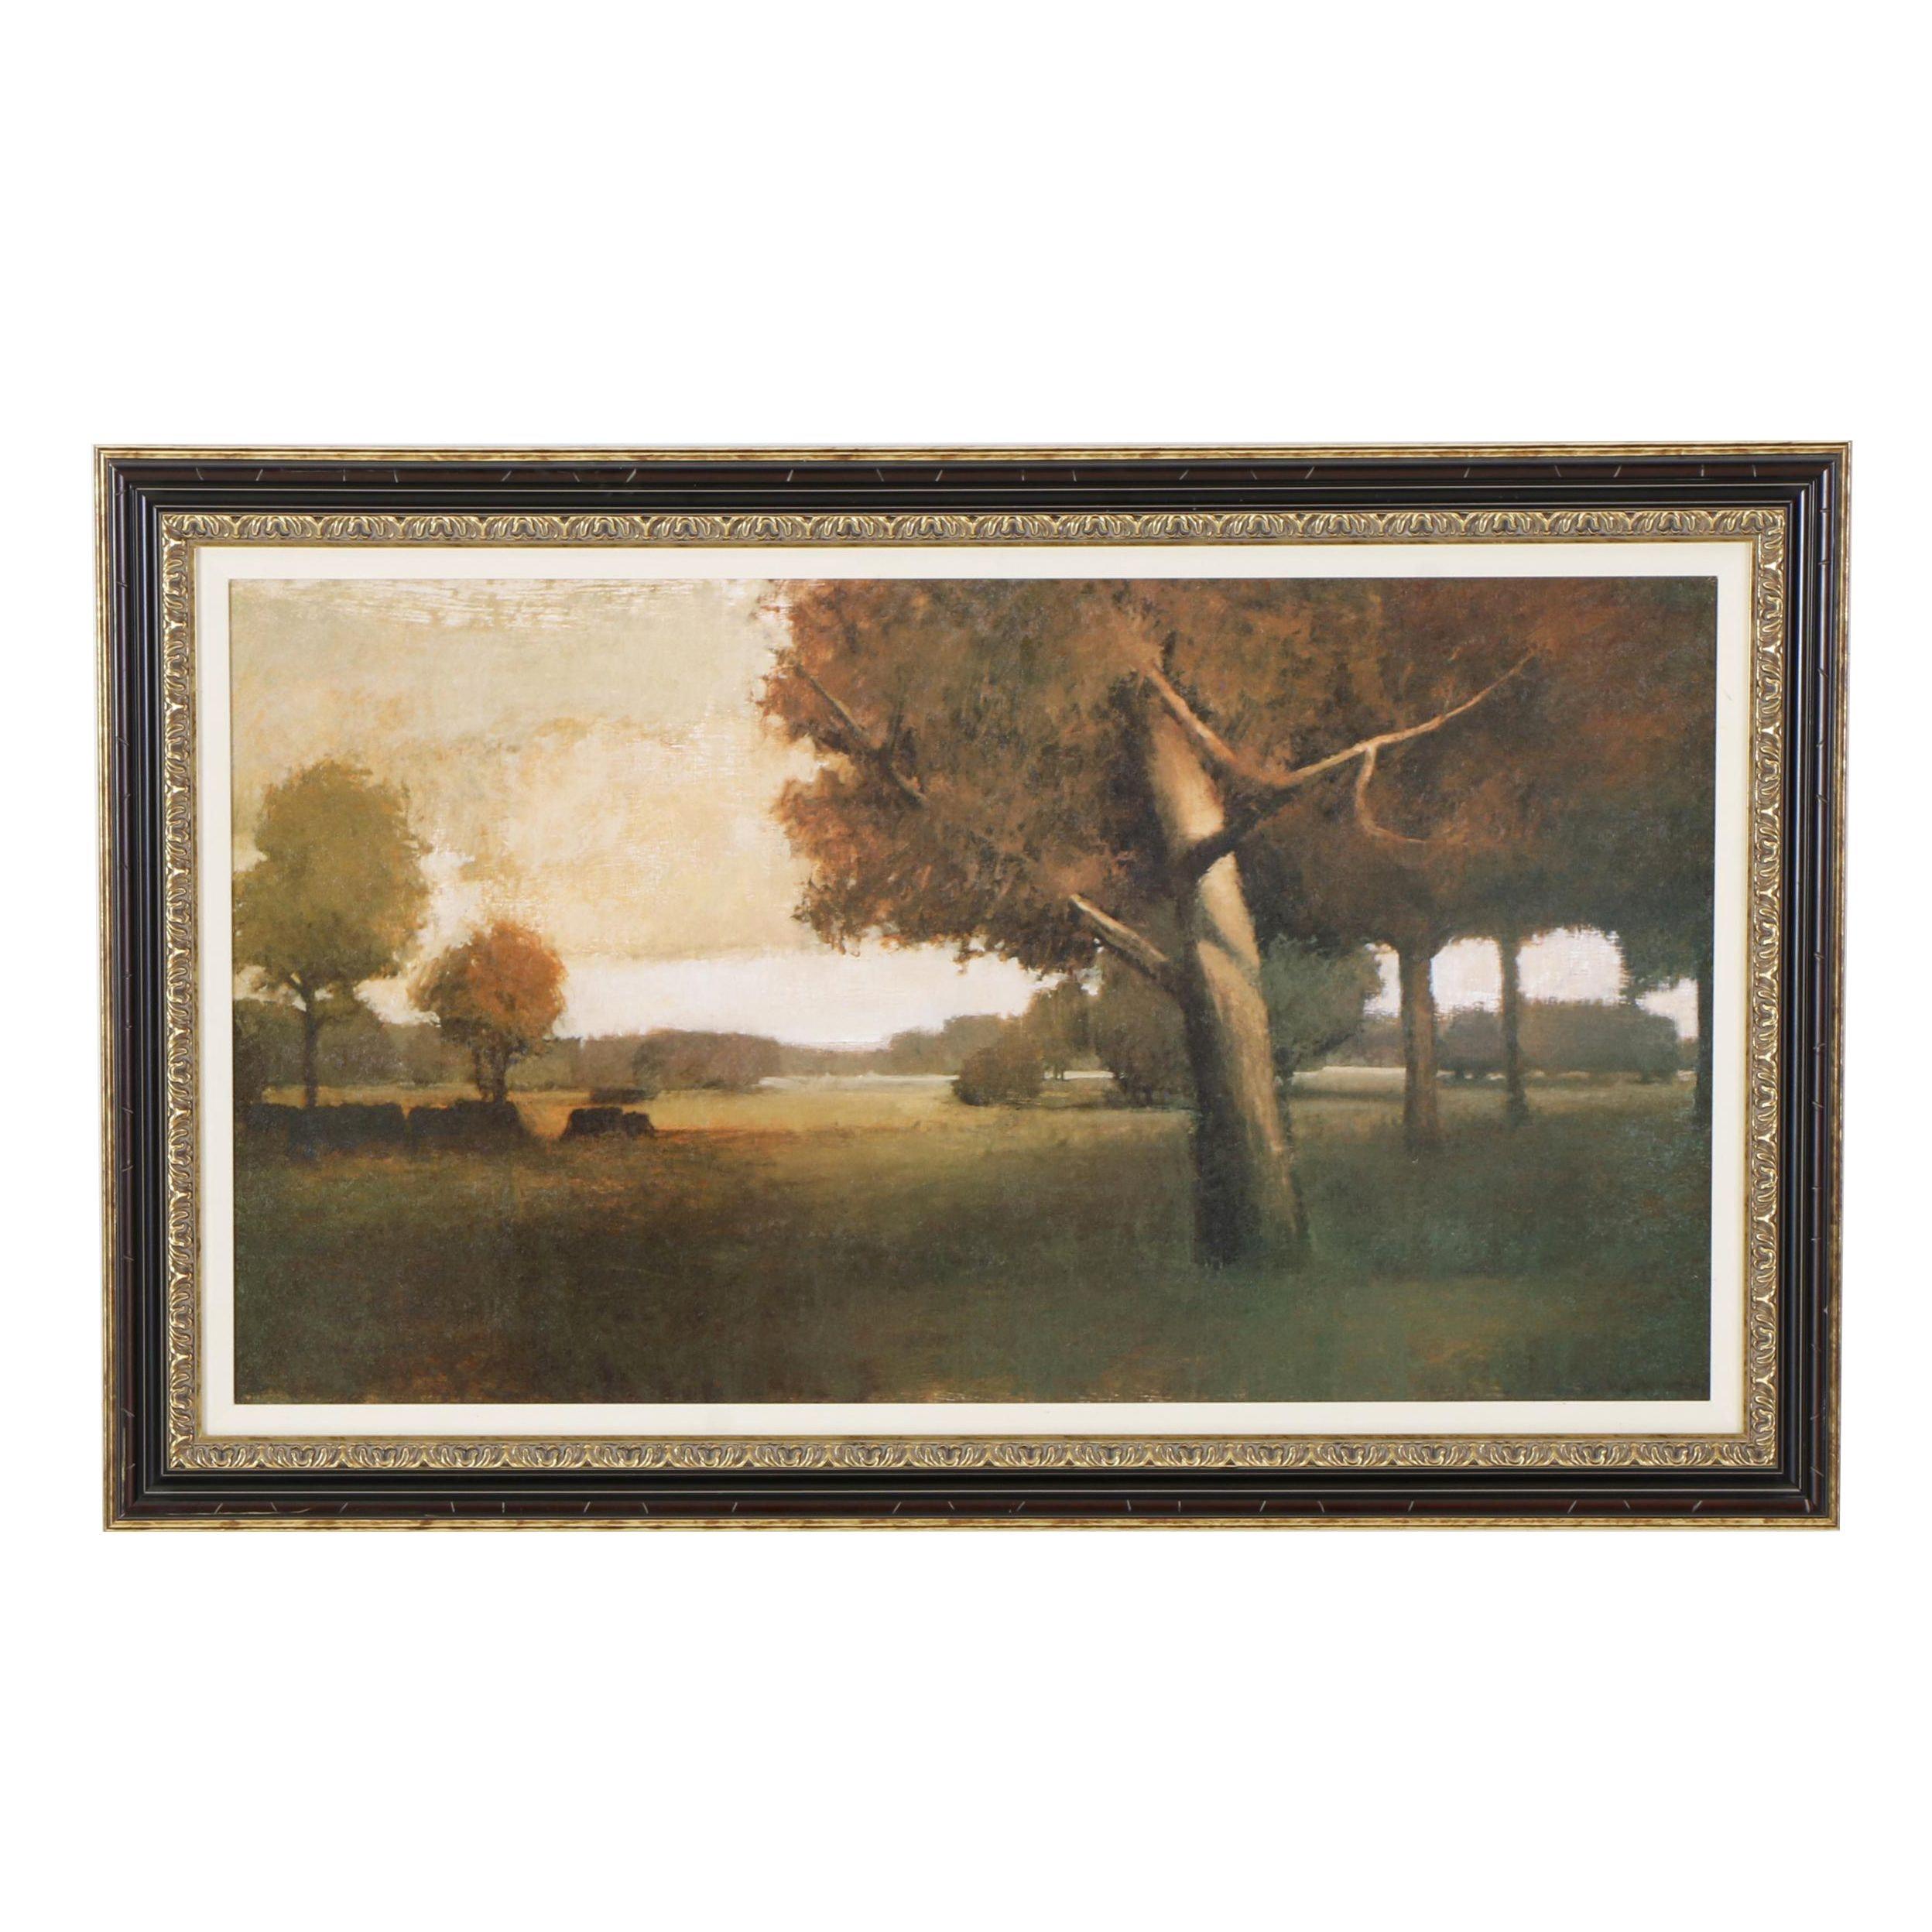 Offset Lithograph of Landscape after Seth Winegar